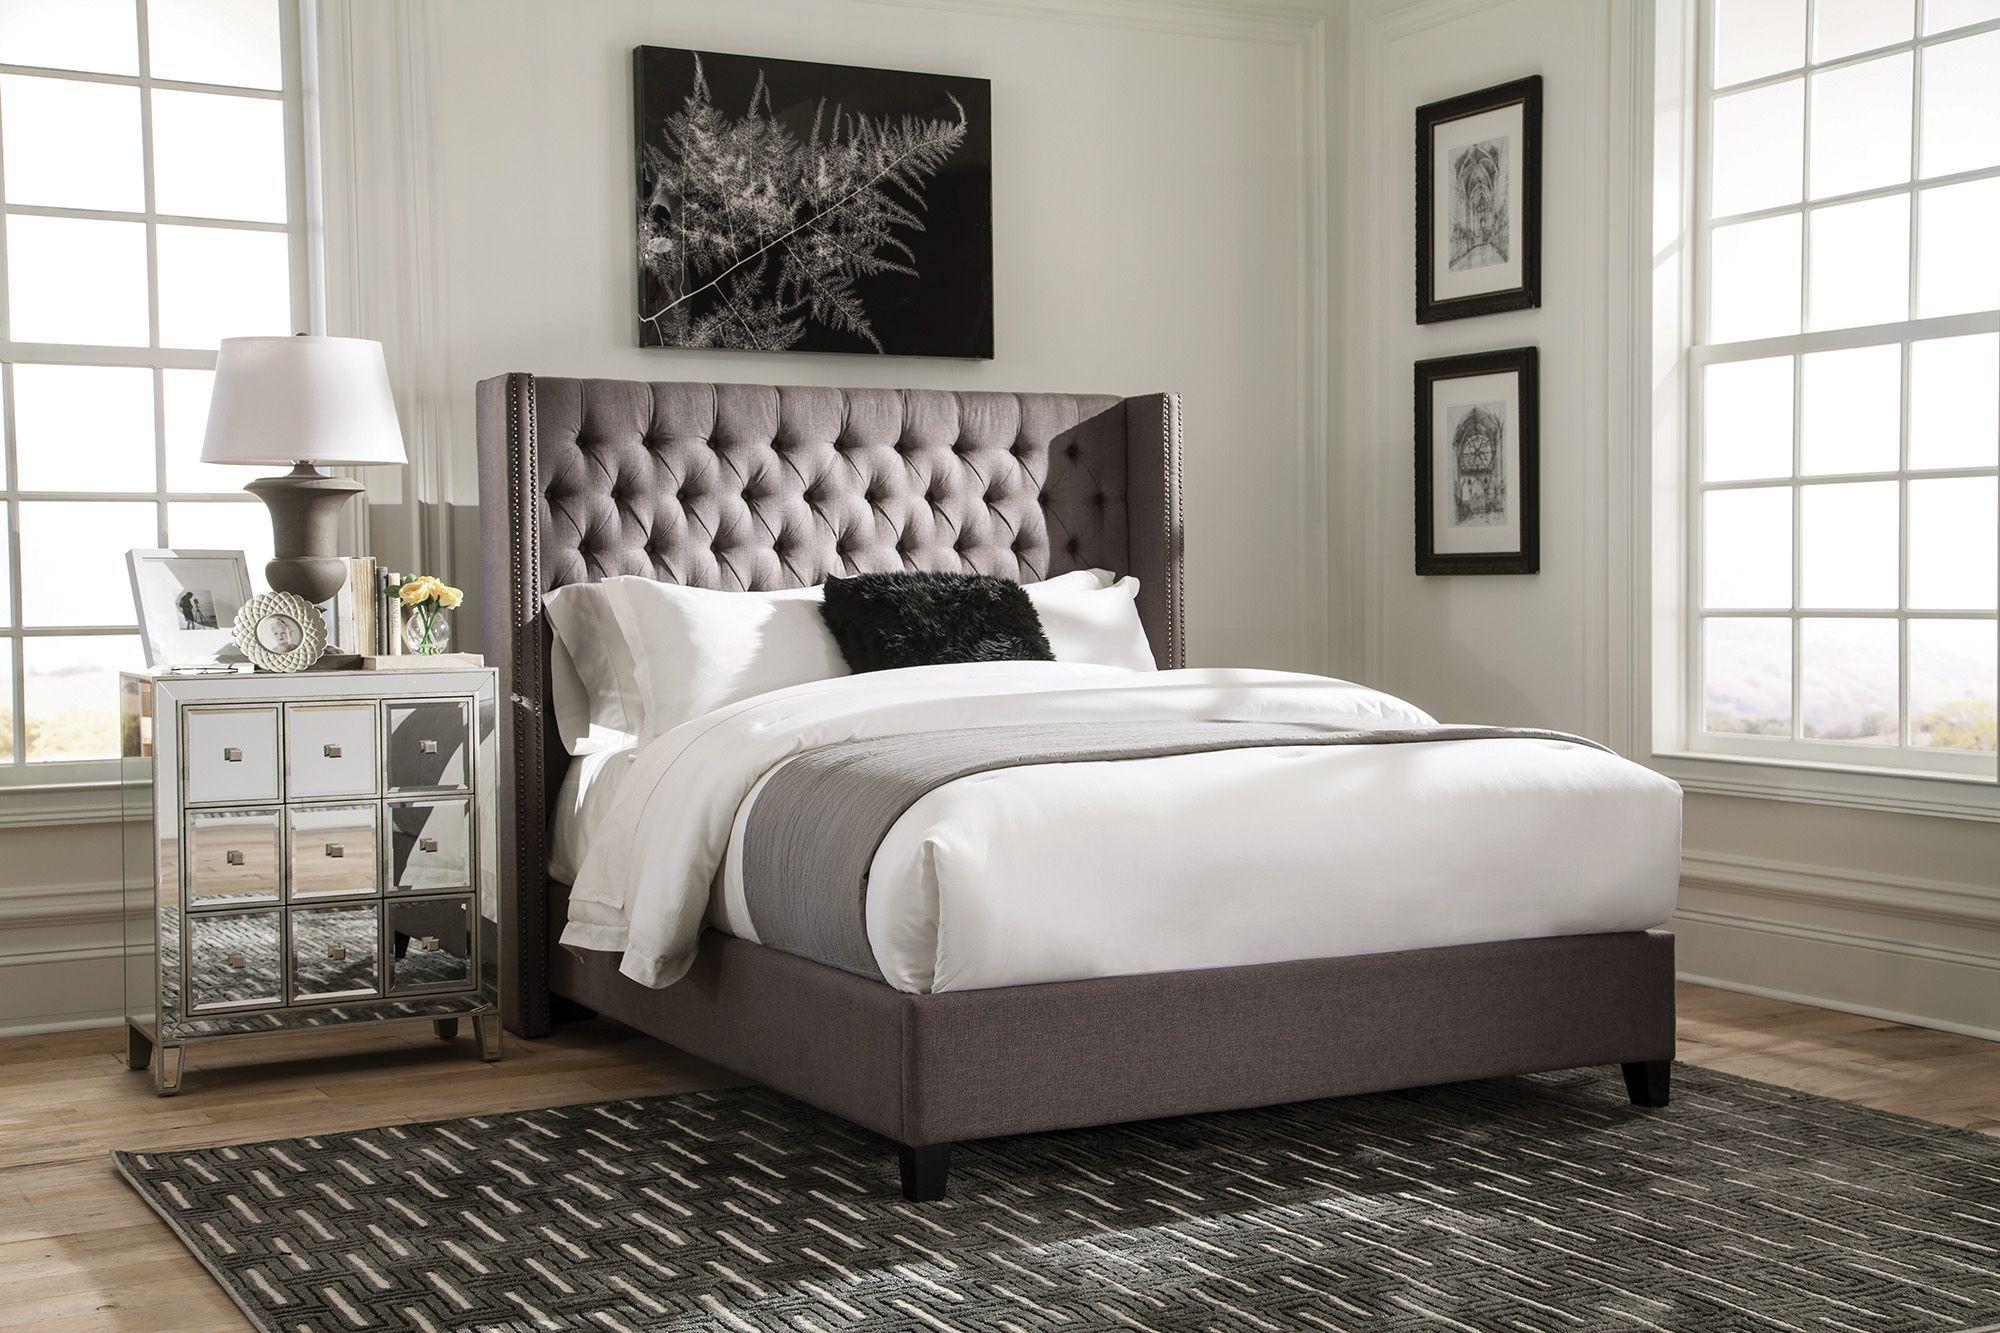 Benicia upholstered bed by scott living